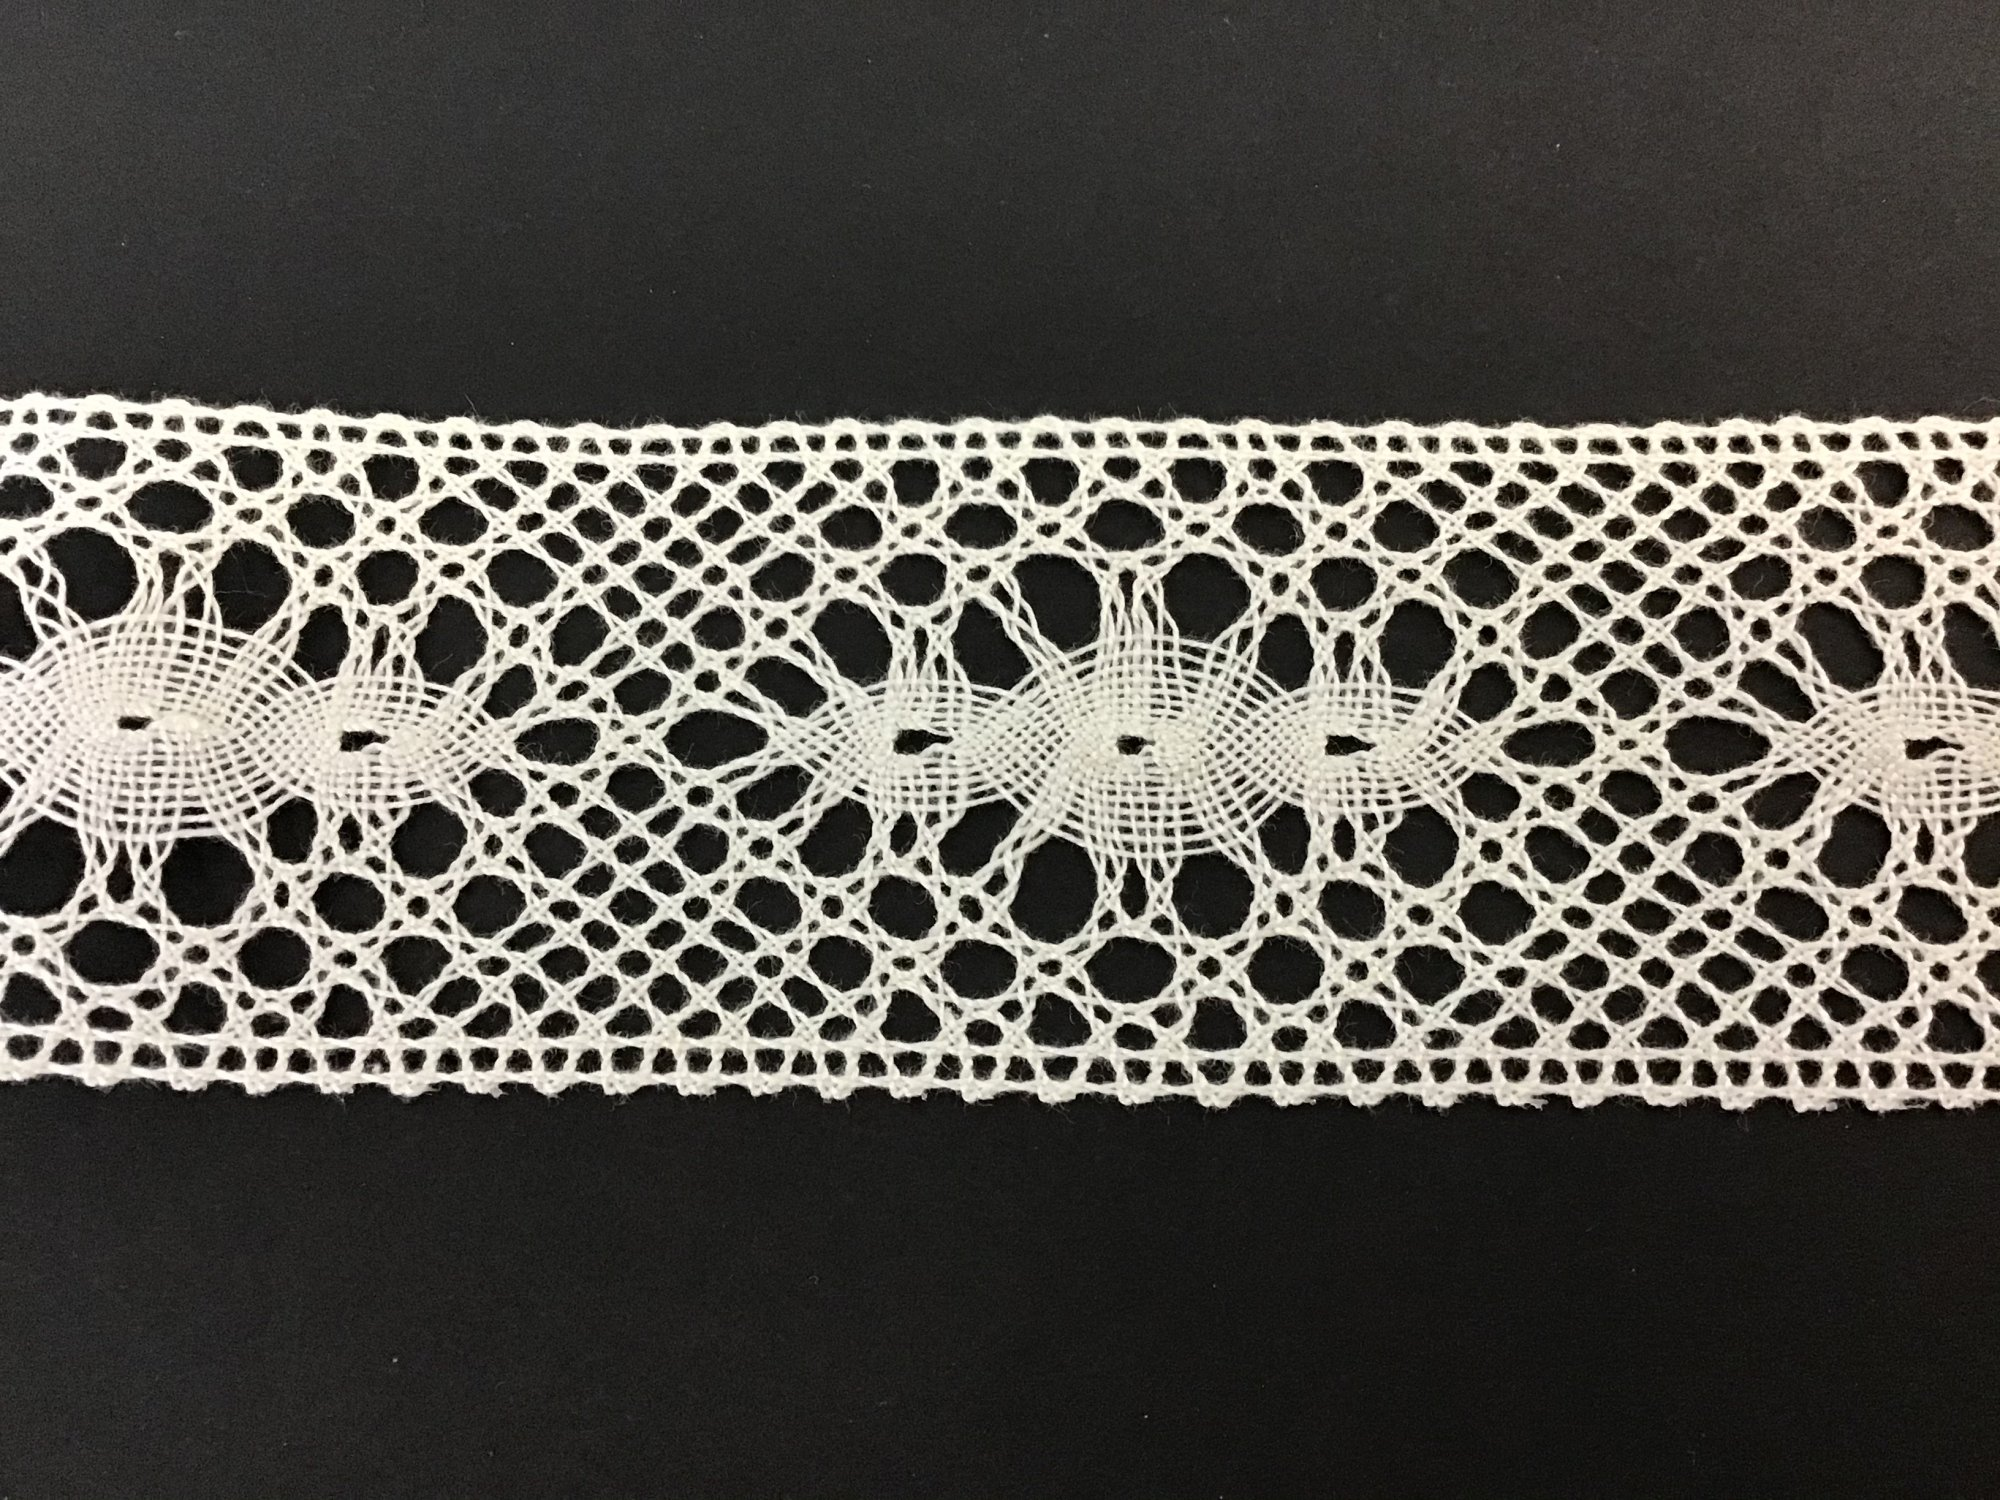 Spanish Cluney Lace Insertion 1 5/8 Inch Ivory 1676-12